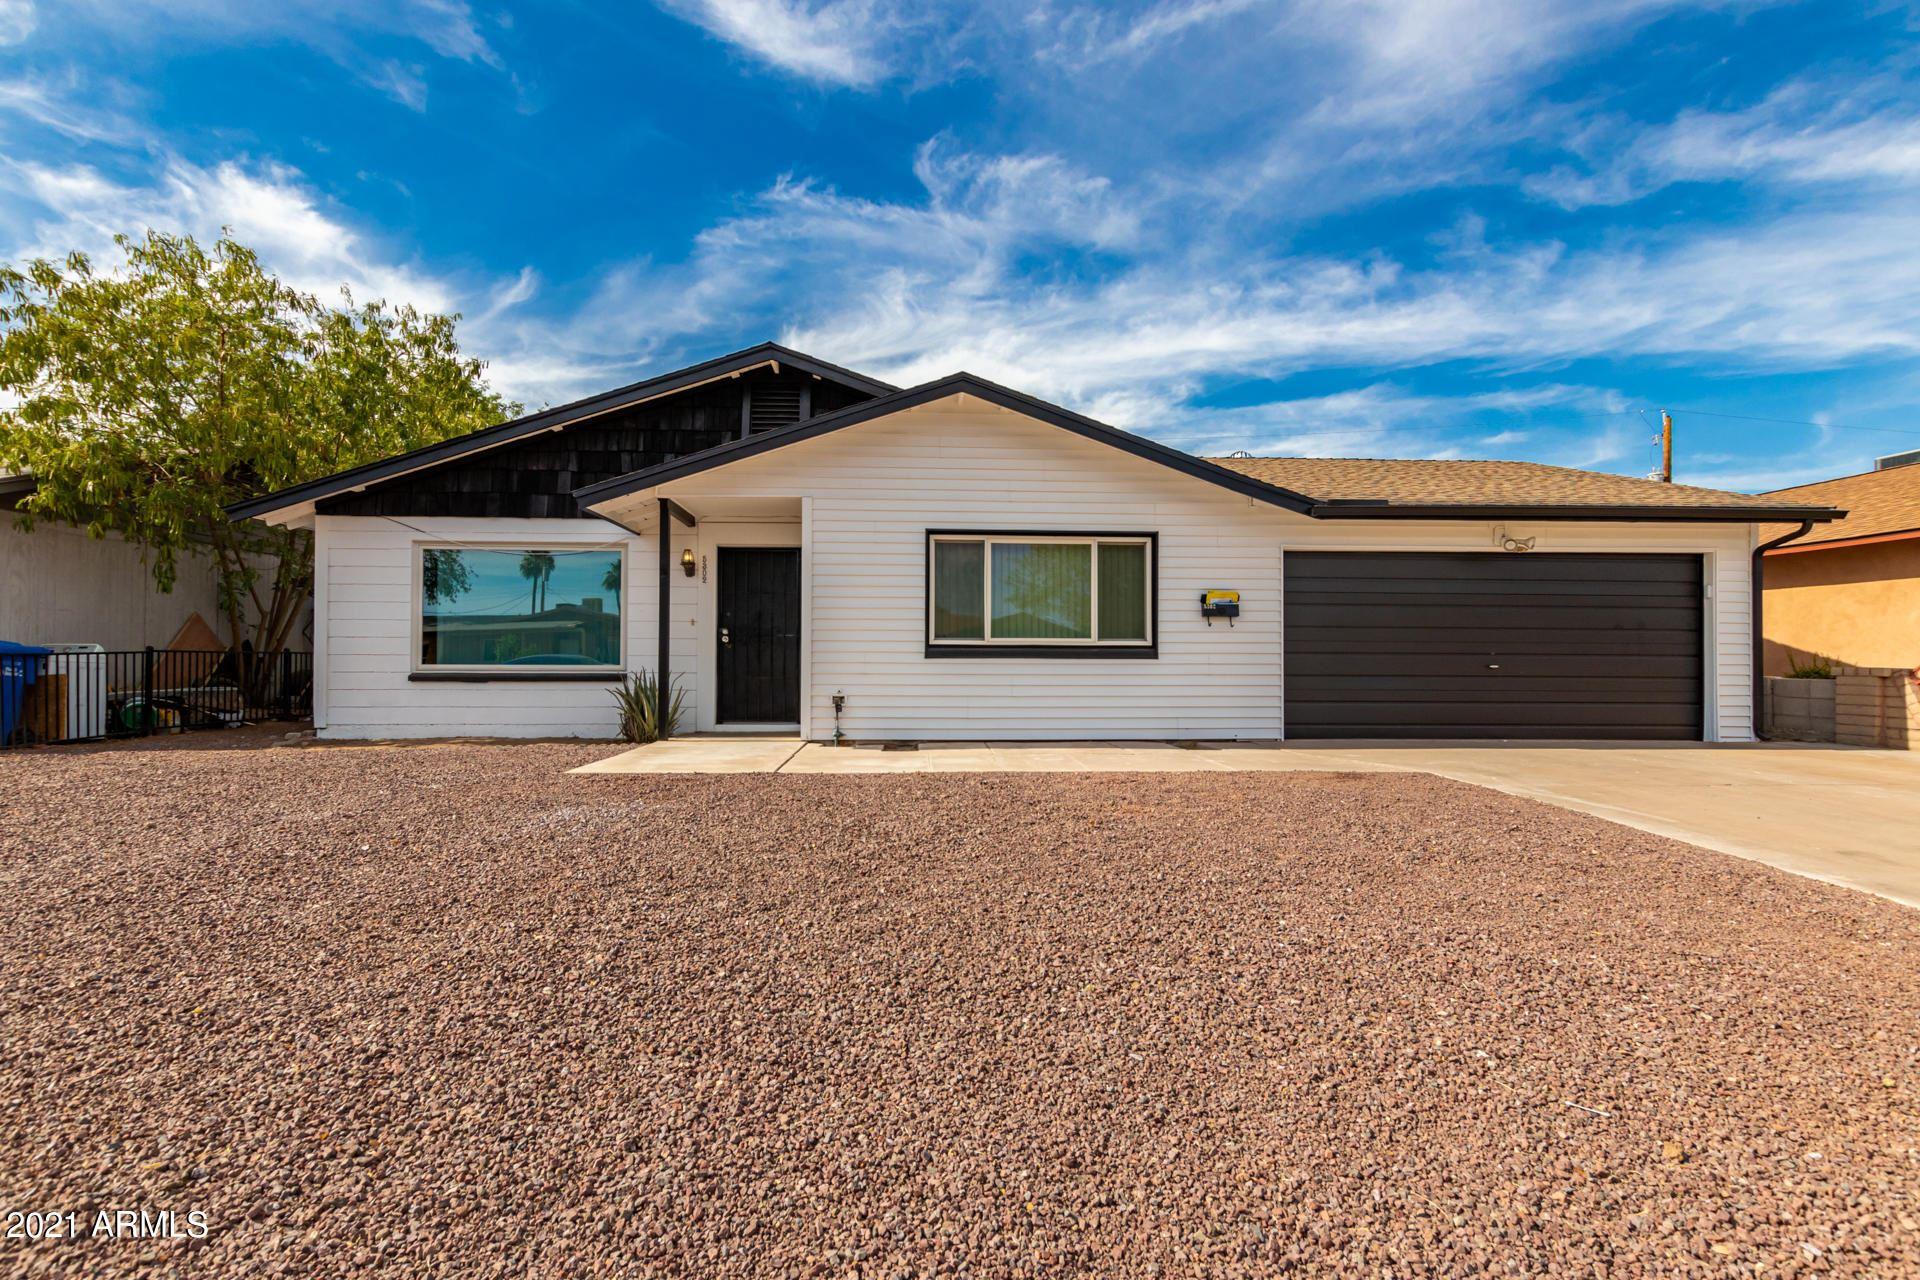 Photo of 5302 W LEWIS Avenue, Phoenix, AZ 85035 (MLS # 6250049)